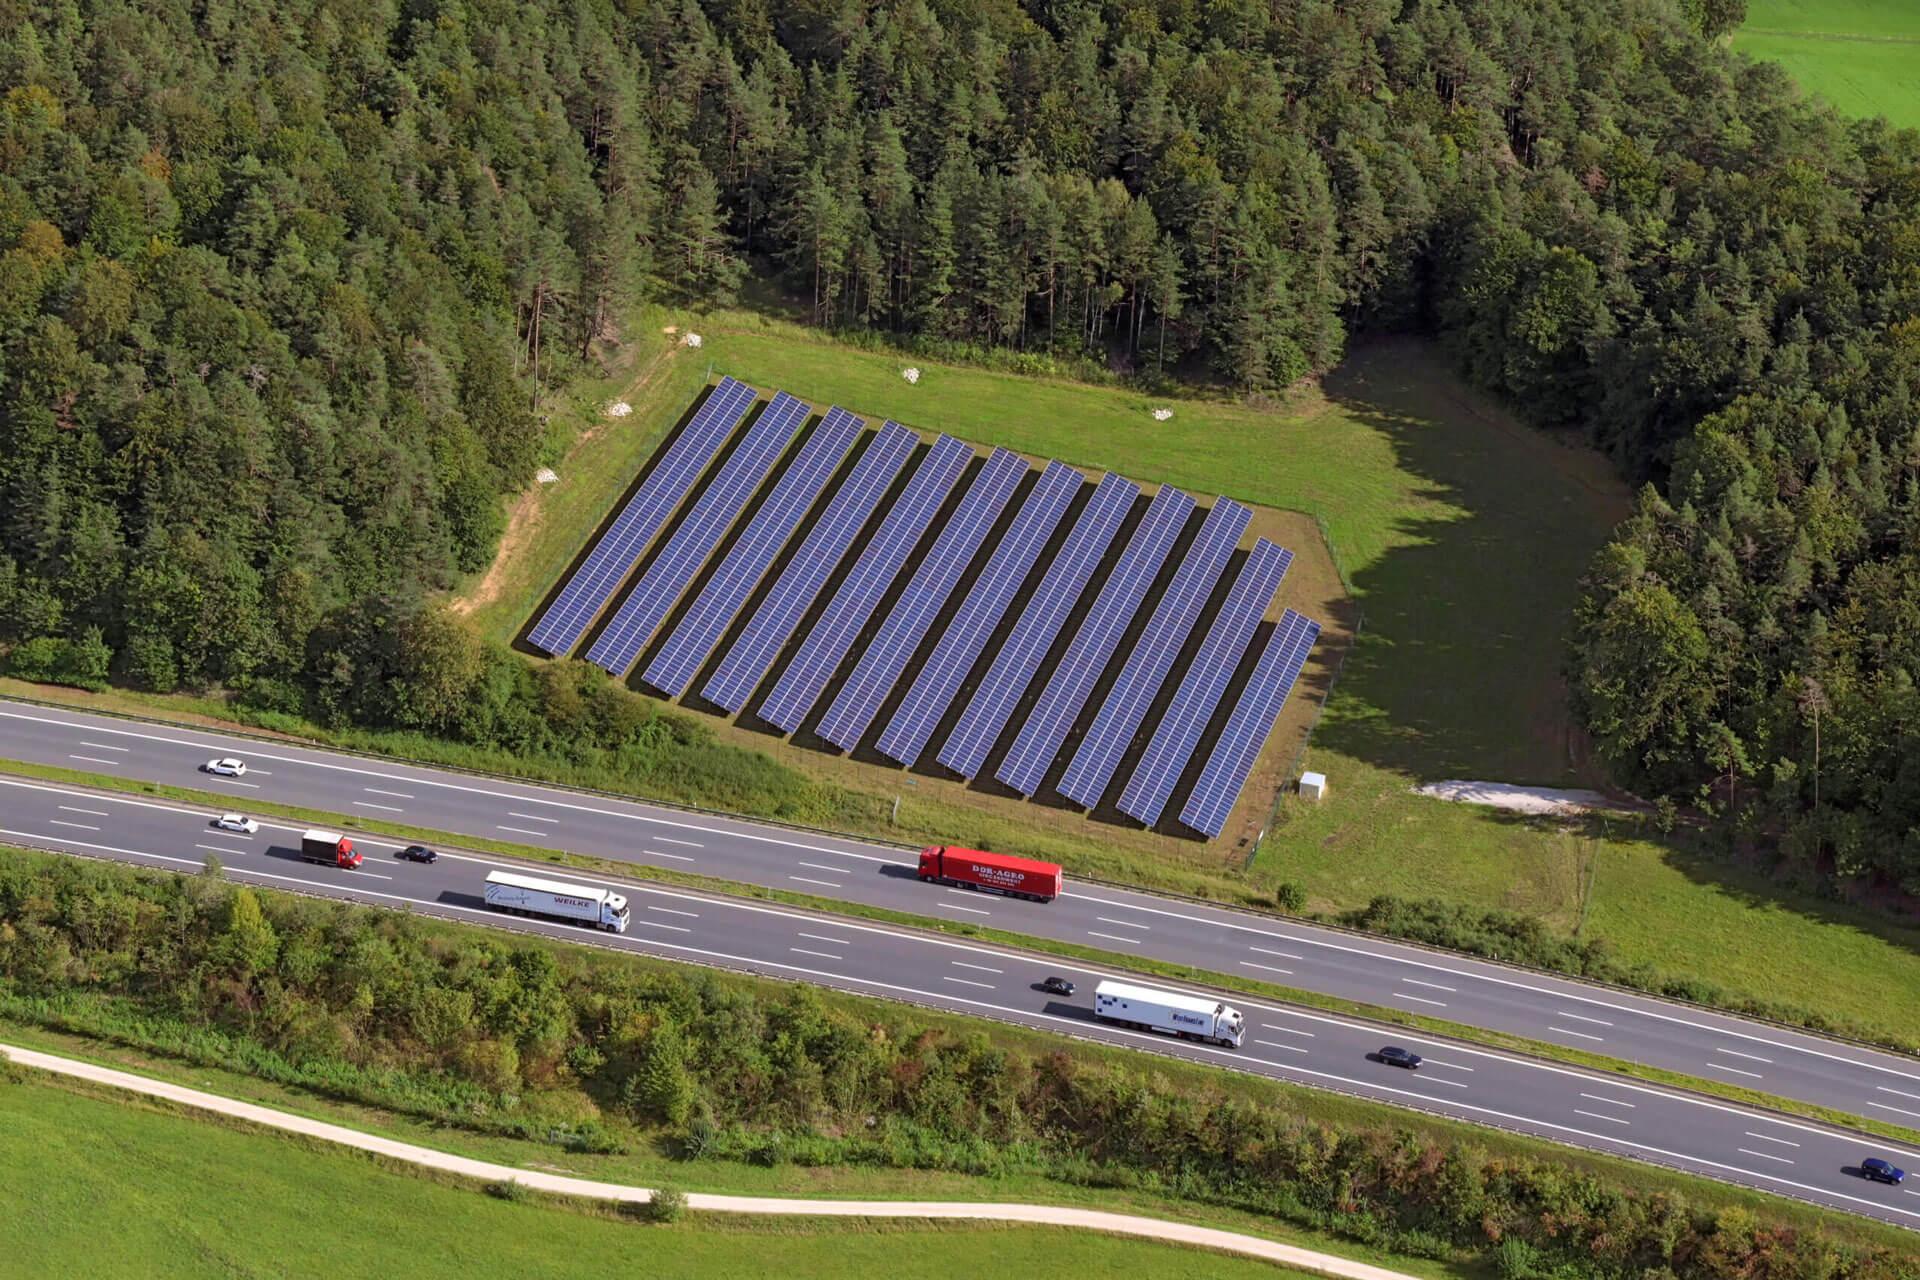 Solarpark Plech Luftbild